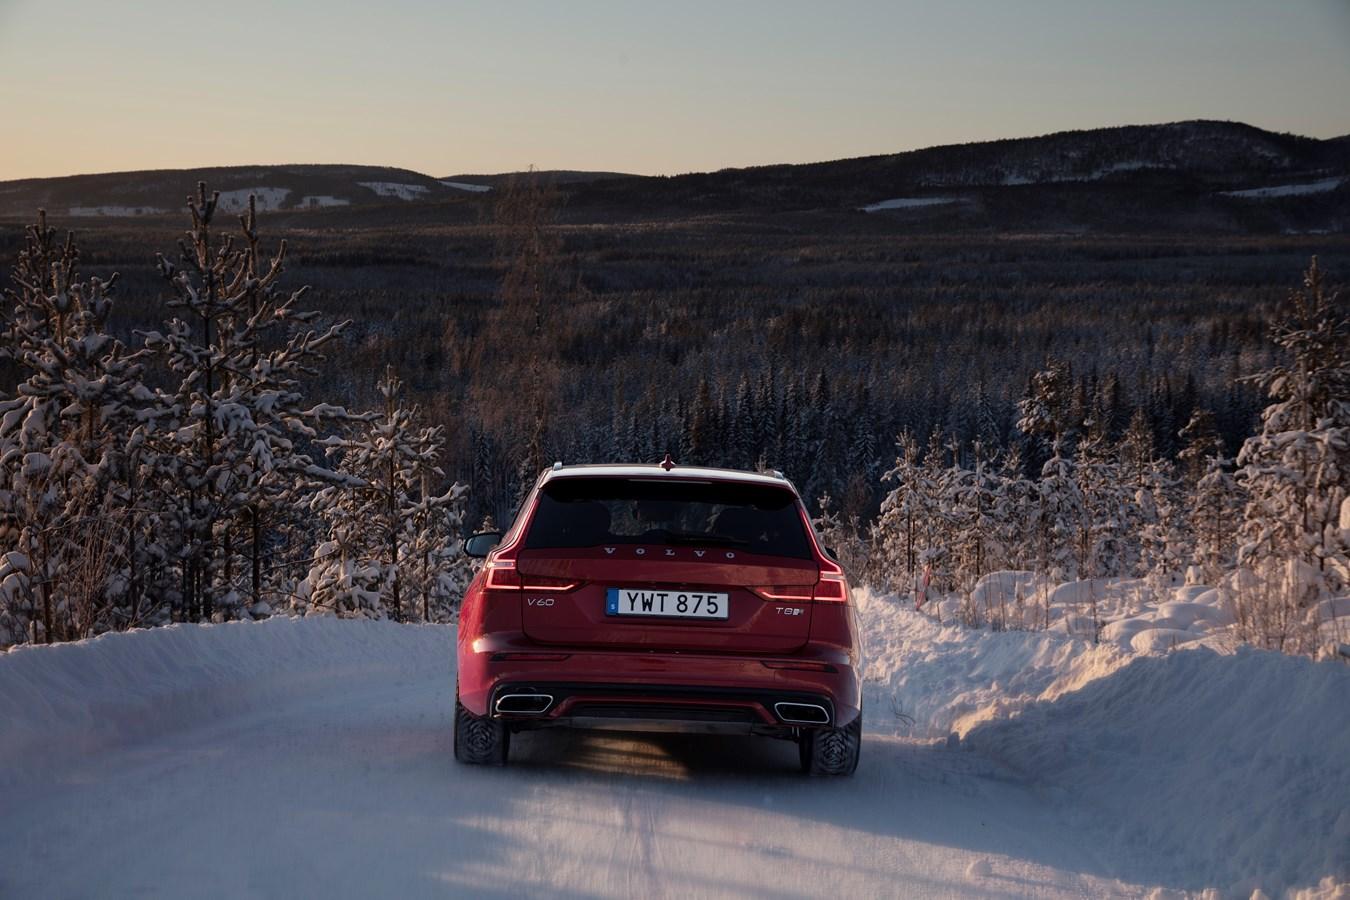 Volvo V60 2020 rijtest review, rating, interieur